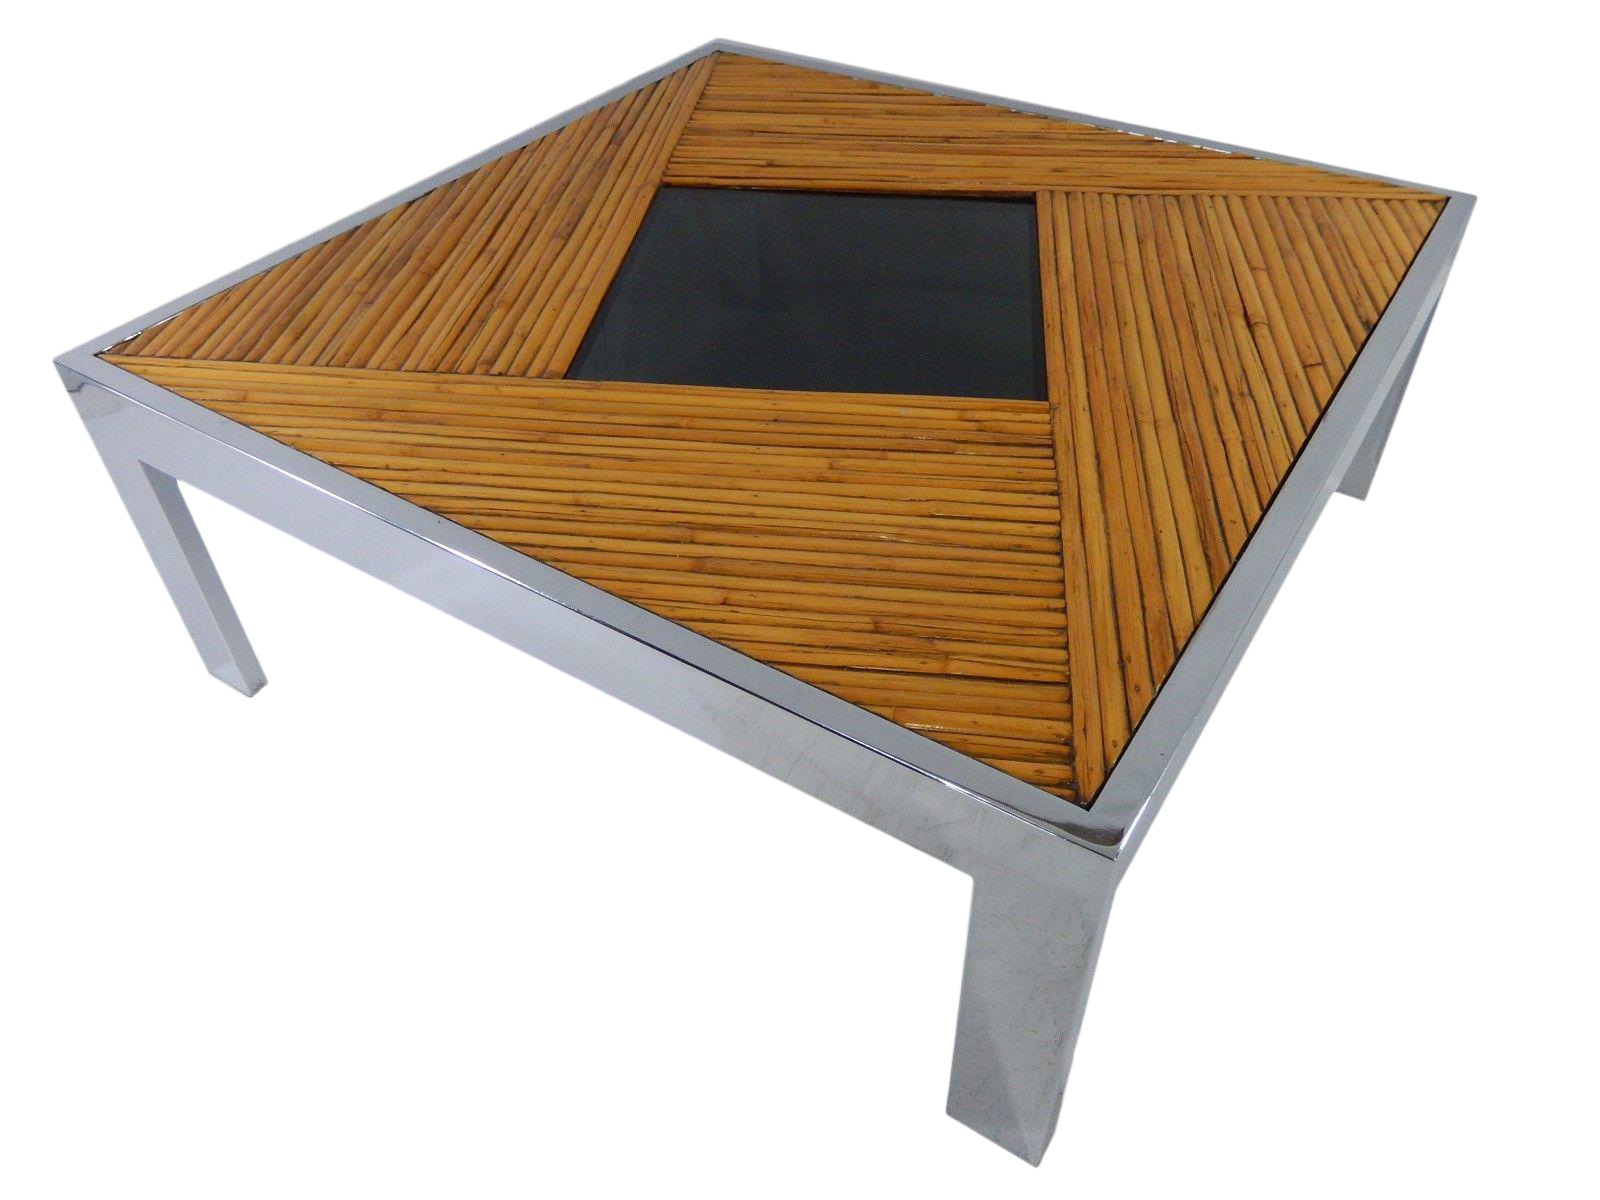 Marvelous Mid Century Milo Baughman Bamboo U0026 Chrome Coffee Table